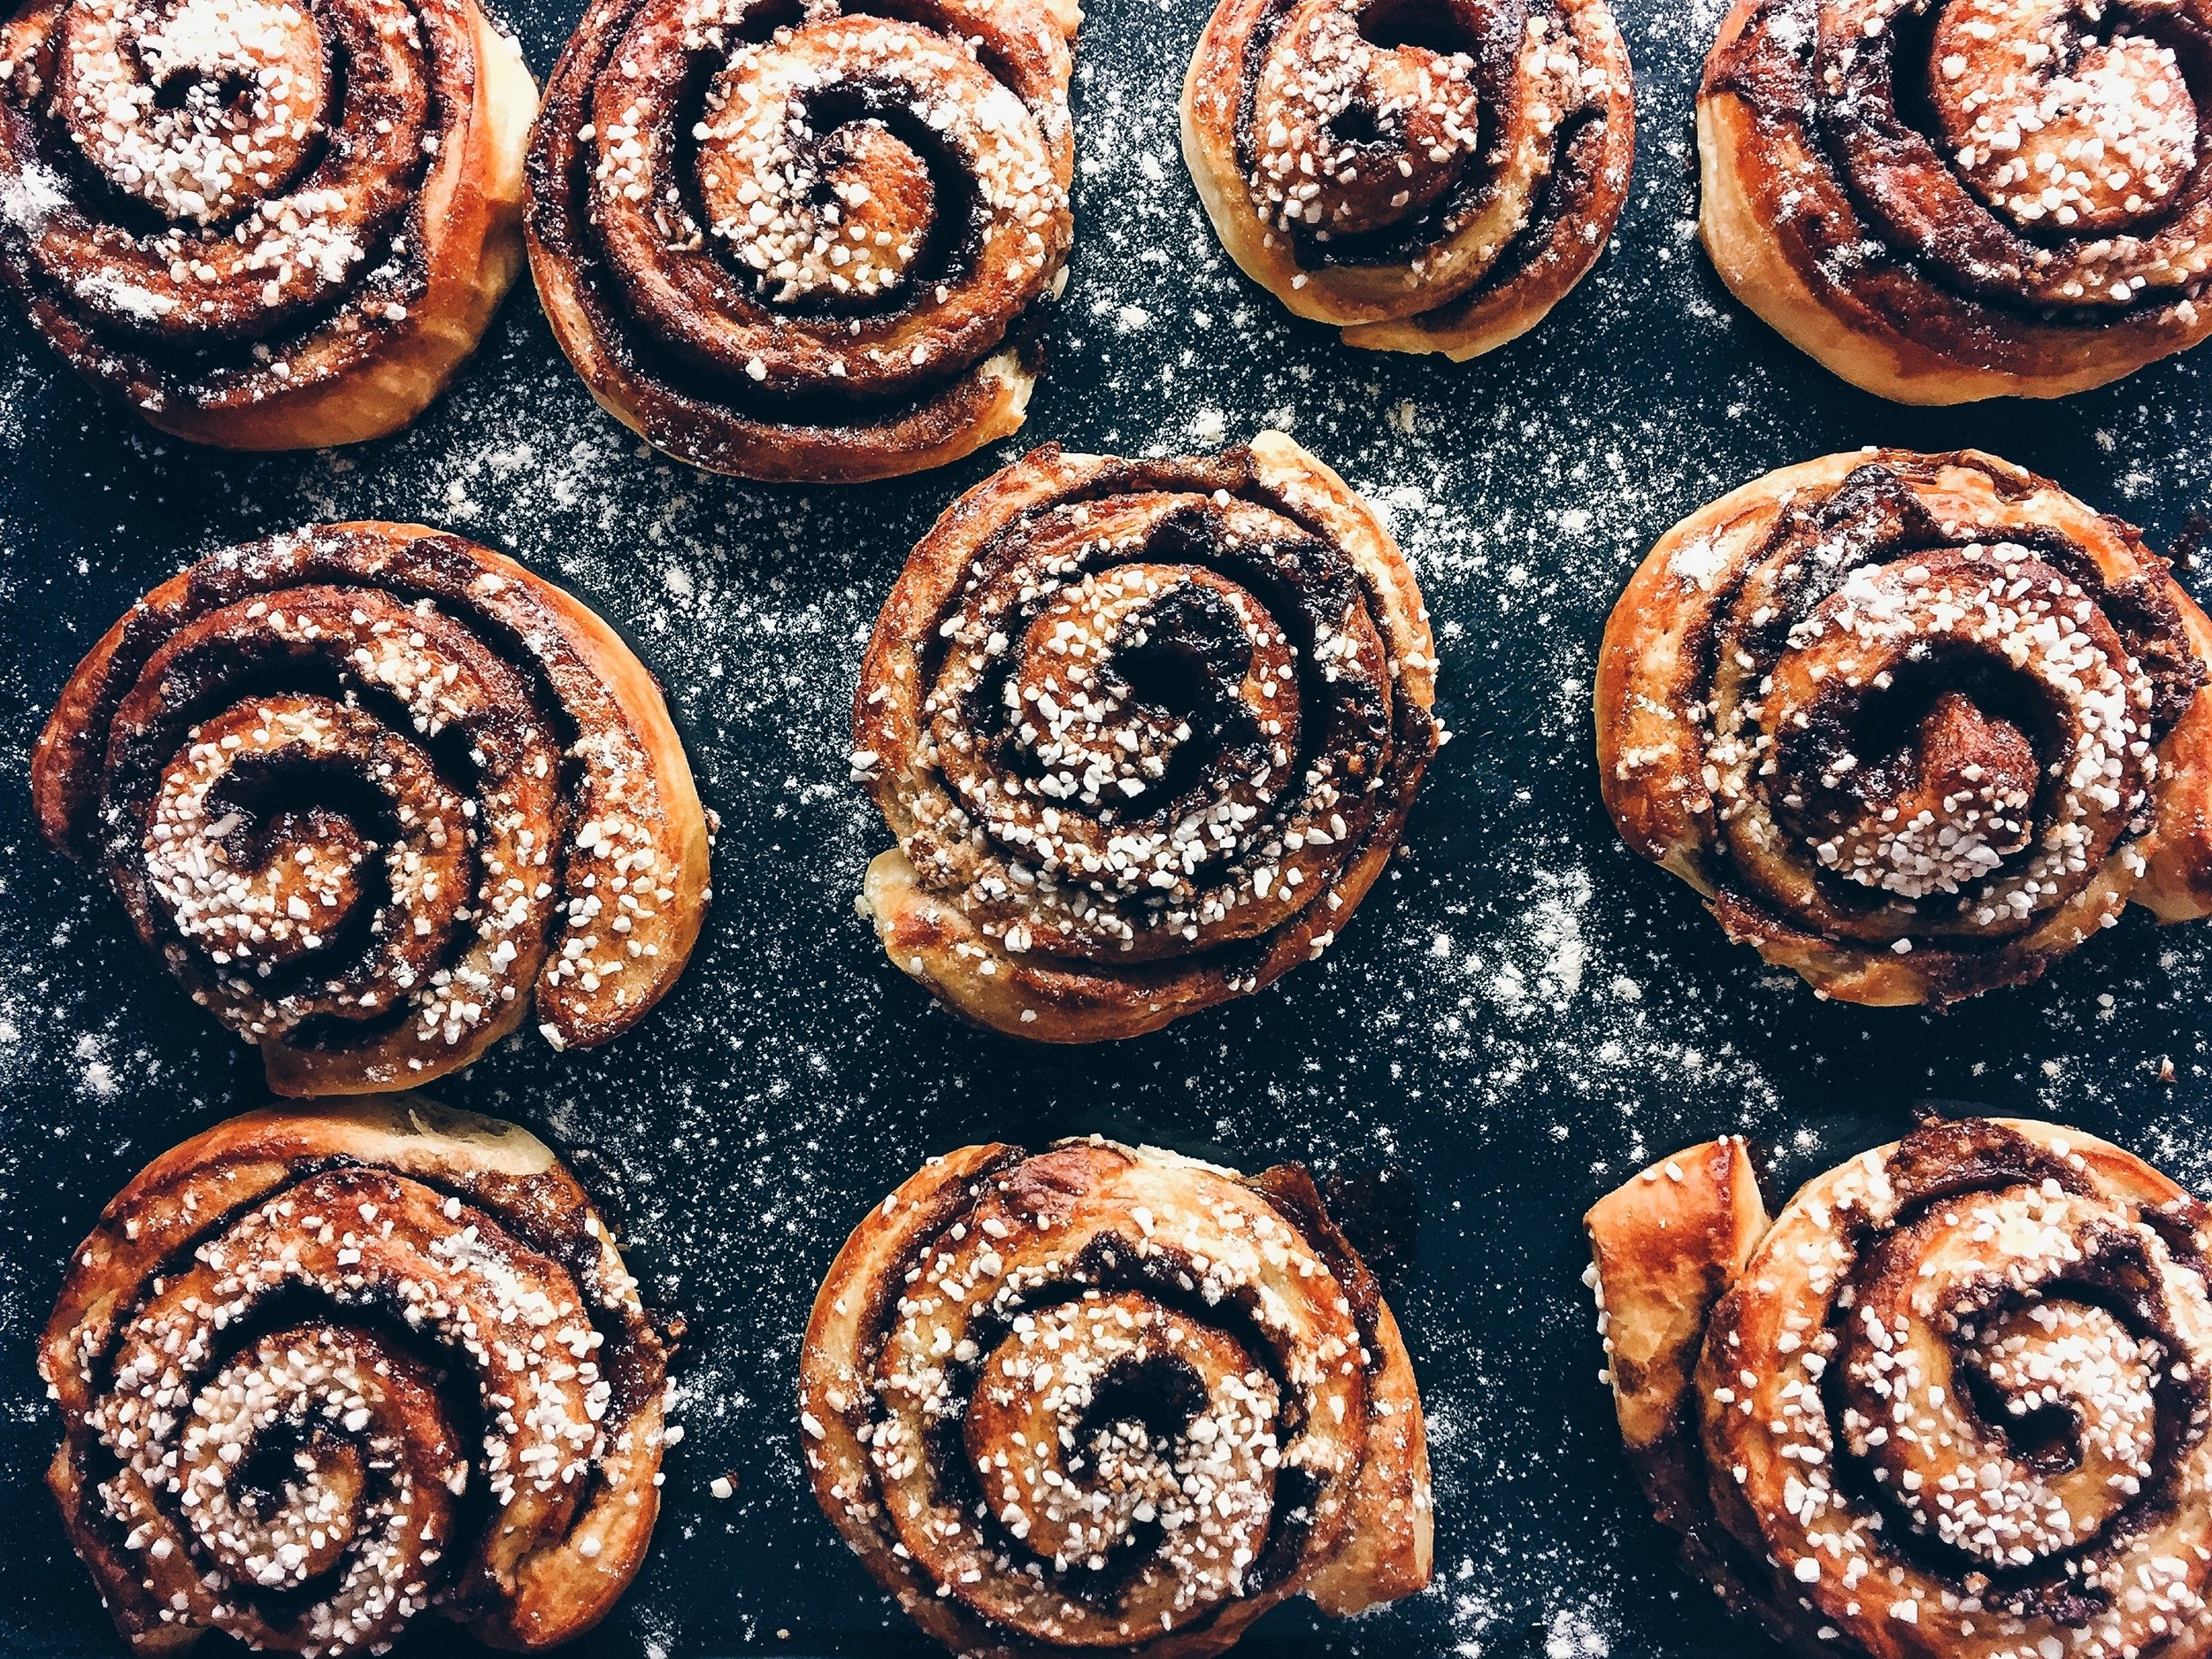 woodfired-eats-cinnamon-rolls-1.jpg